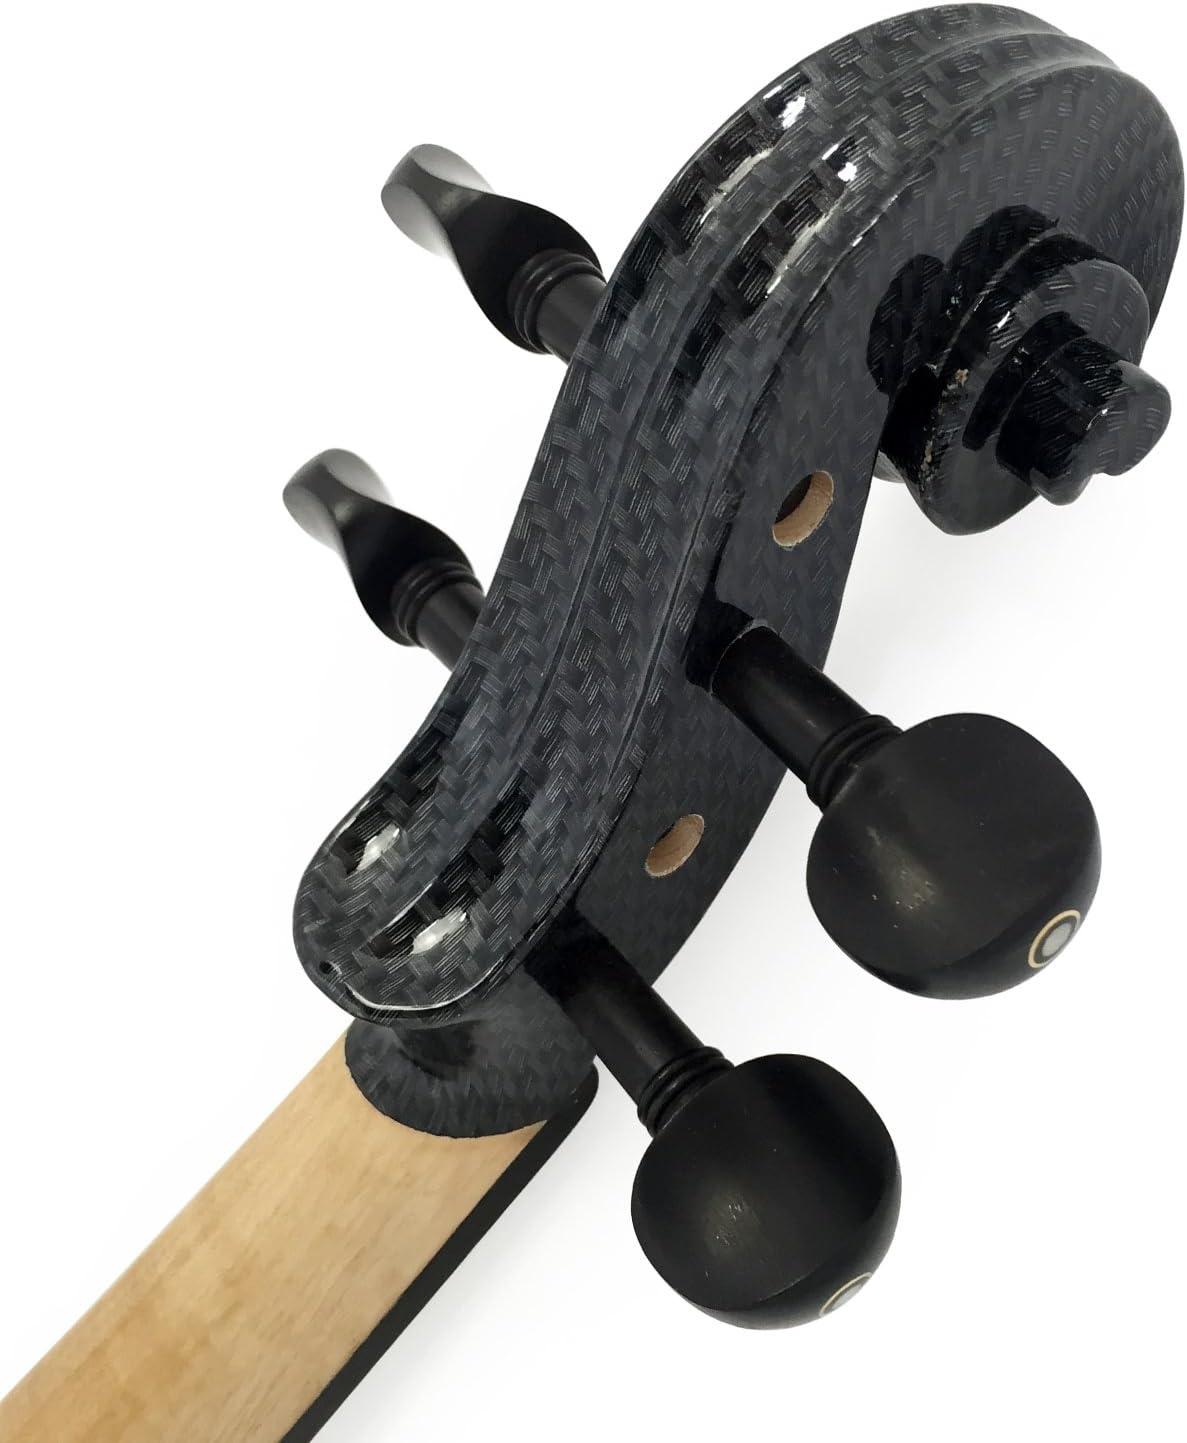 Leeche Wood Electric Violin Full Size 4//4 Advanced Intermediate Electric Silent Carbon Fiber Violin Kit With Case,Bow,Rosin,headphones,Shoulder Rest,Strings,Finger Guide